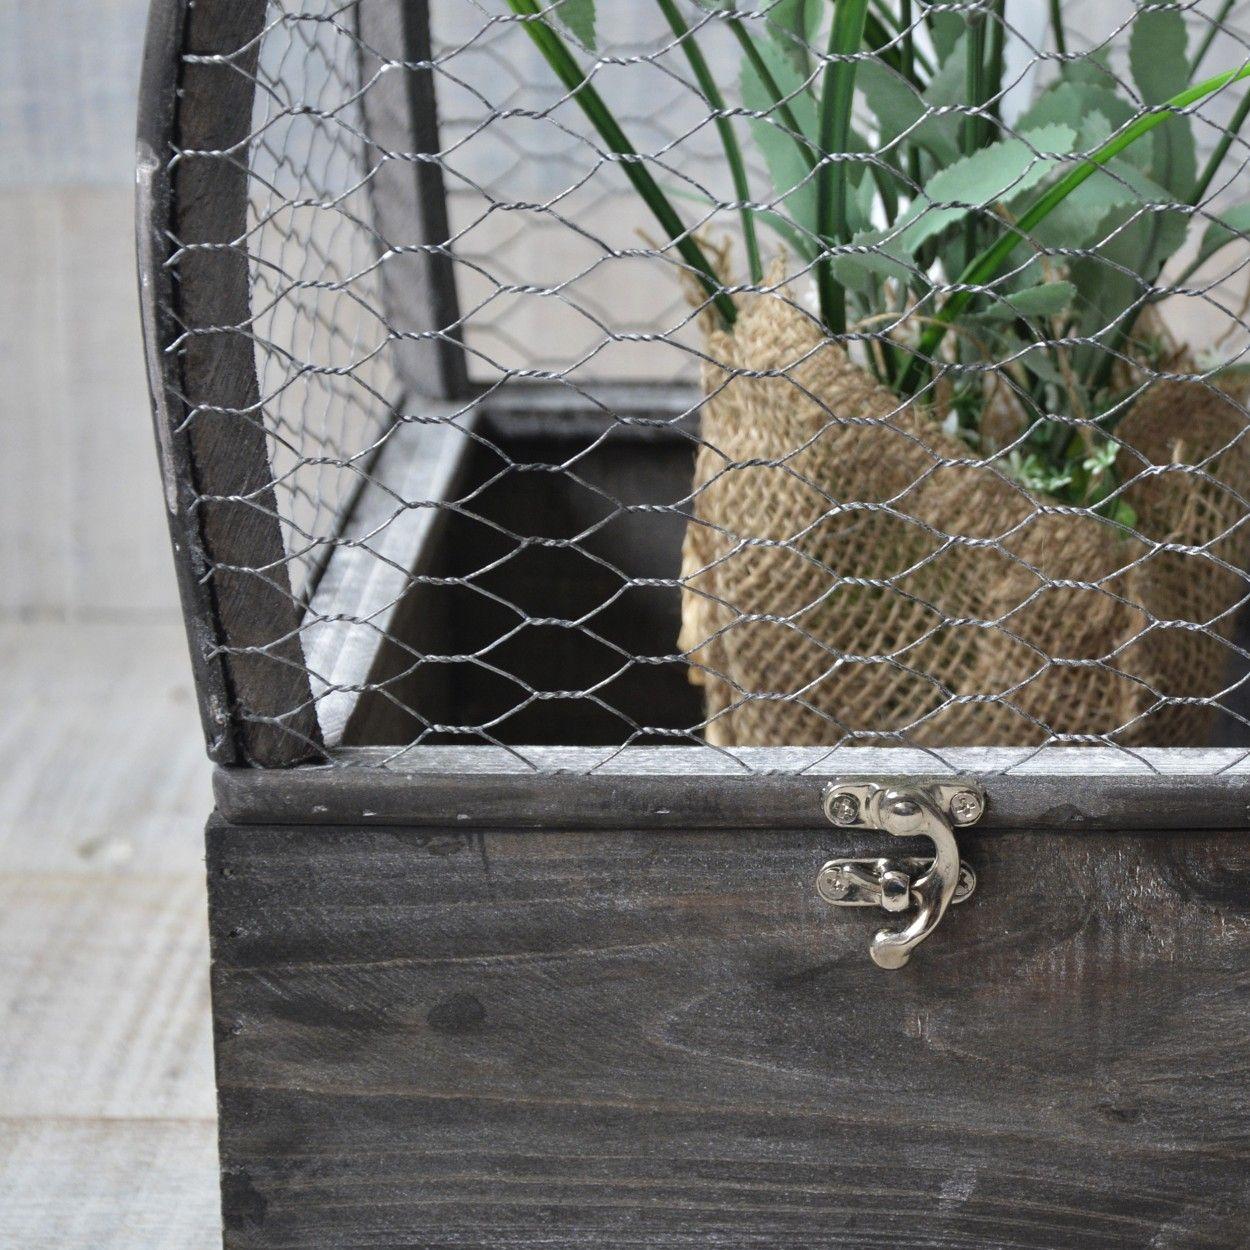 Jaula madera natural original para decoraci n juego hogar - Decoracion original hogar ...